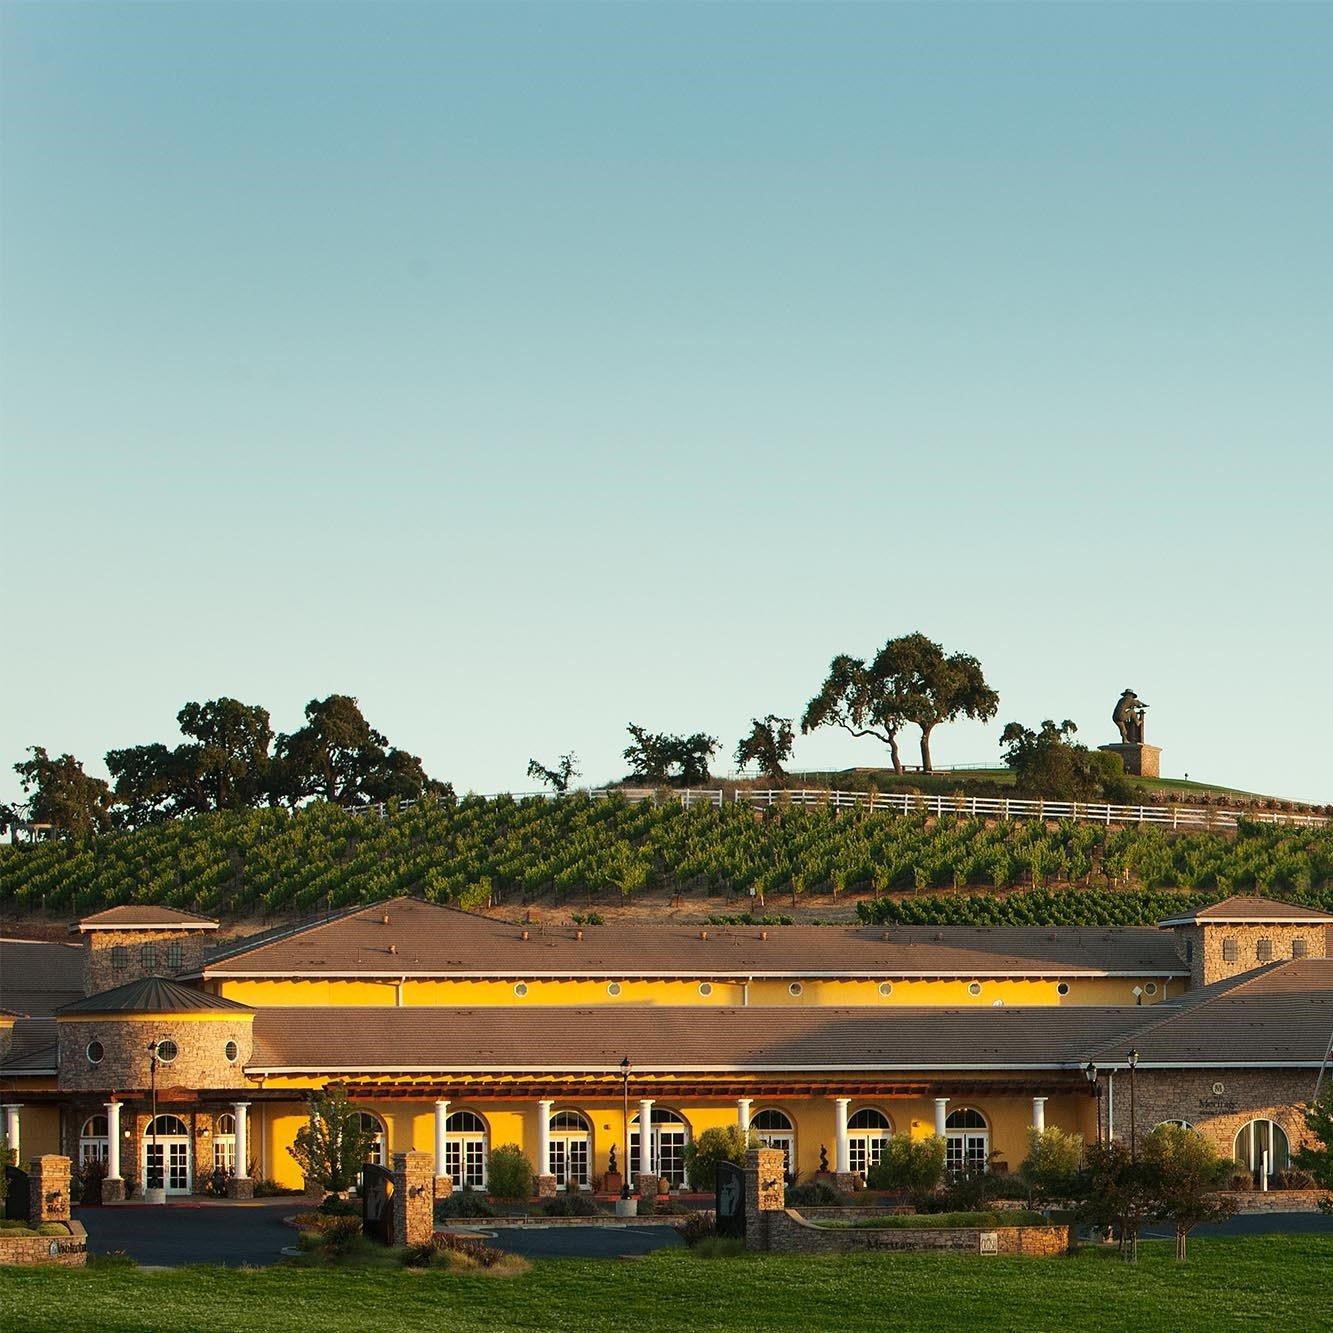 the scenic Meritage Resort and vineyard